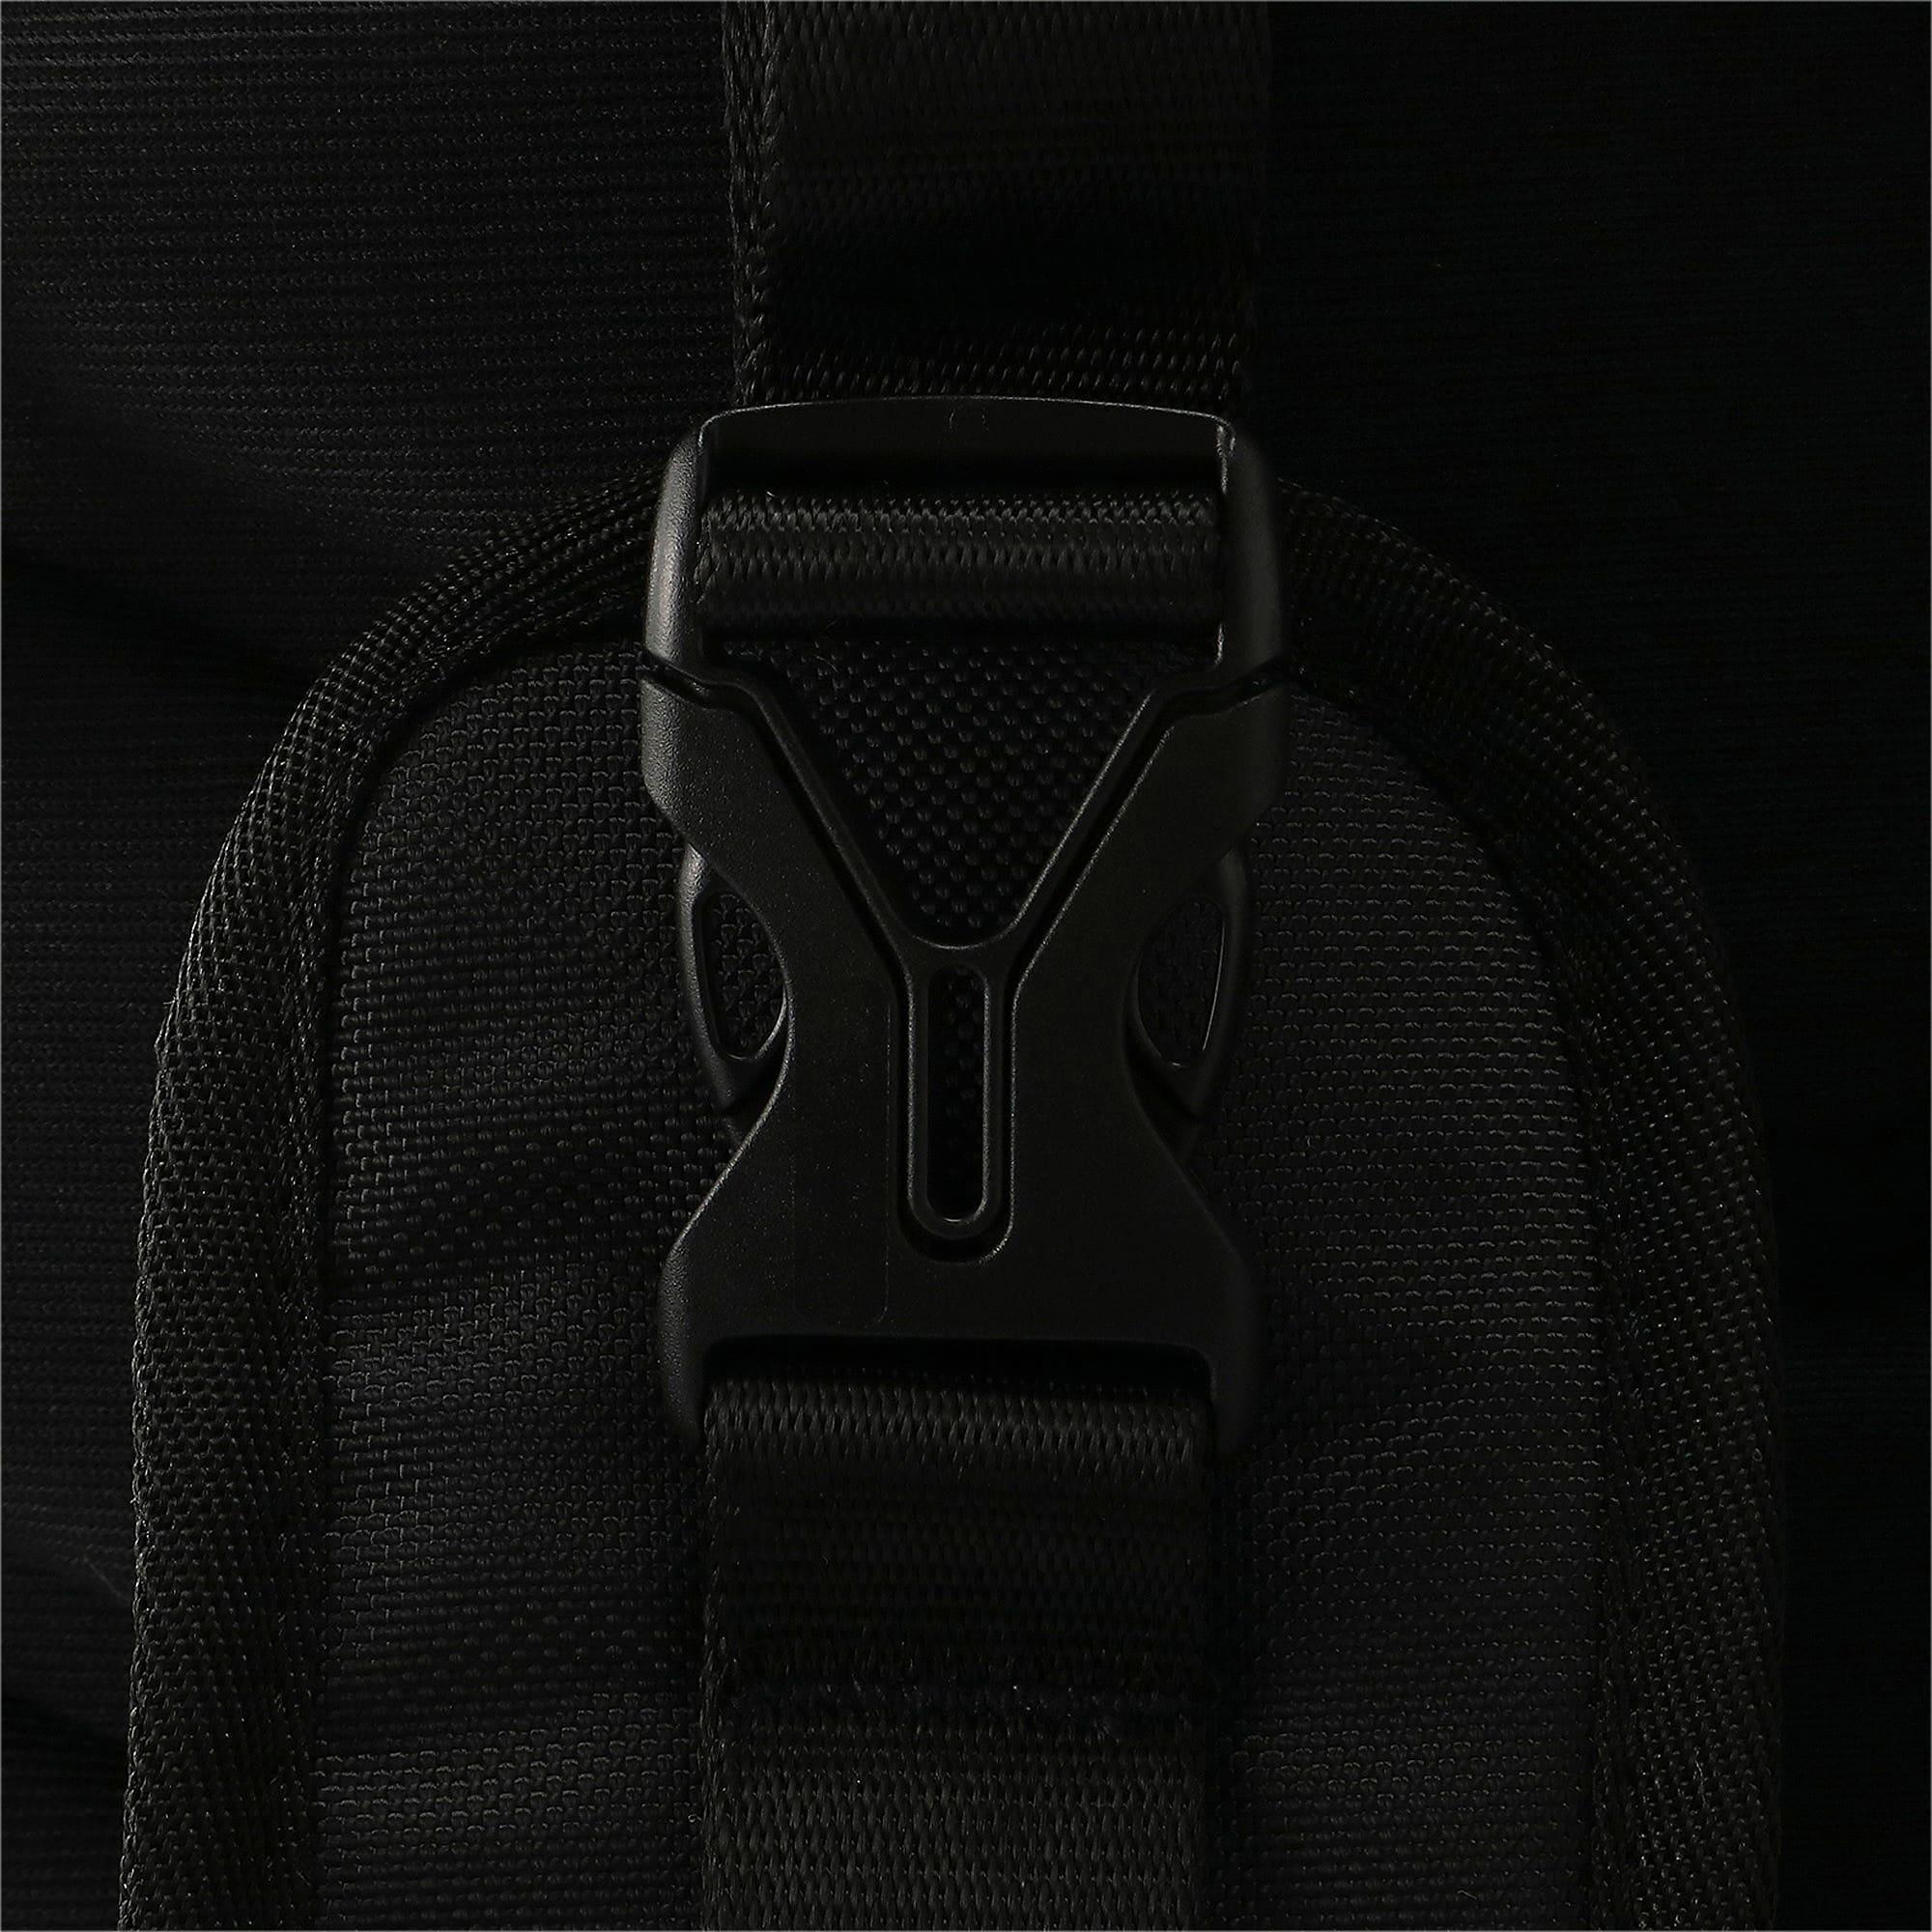 Thumbnail 8 of ポルシェデザイン PD ジム ダッフルバッグ 36L, Puma Black, medium-JPN